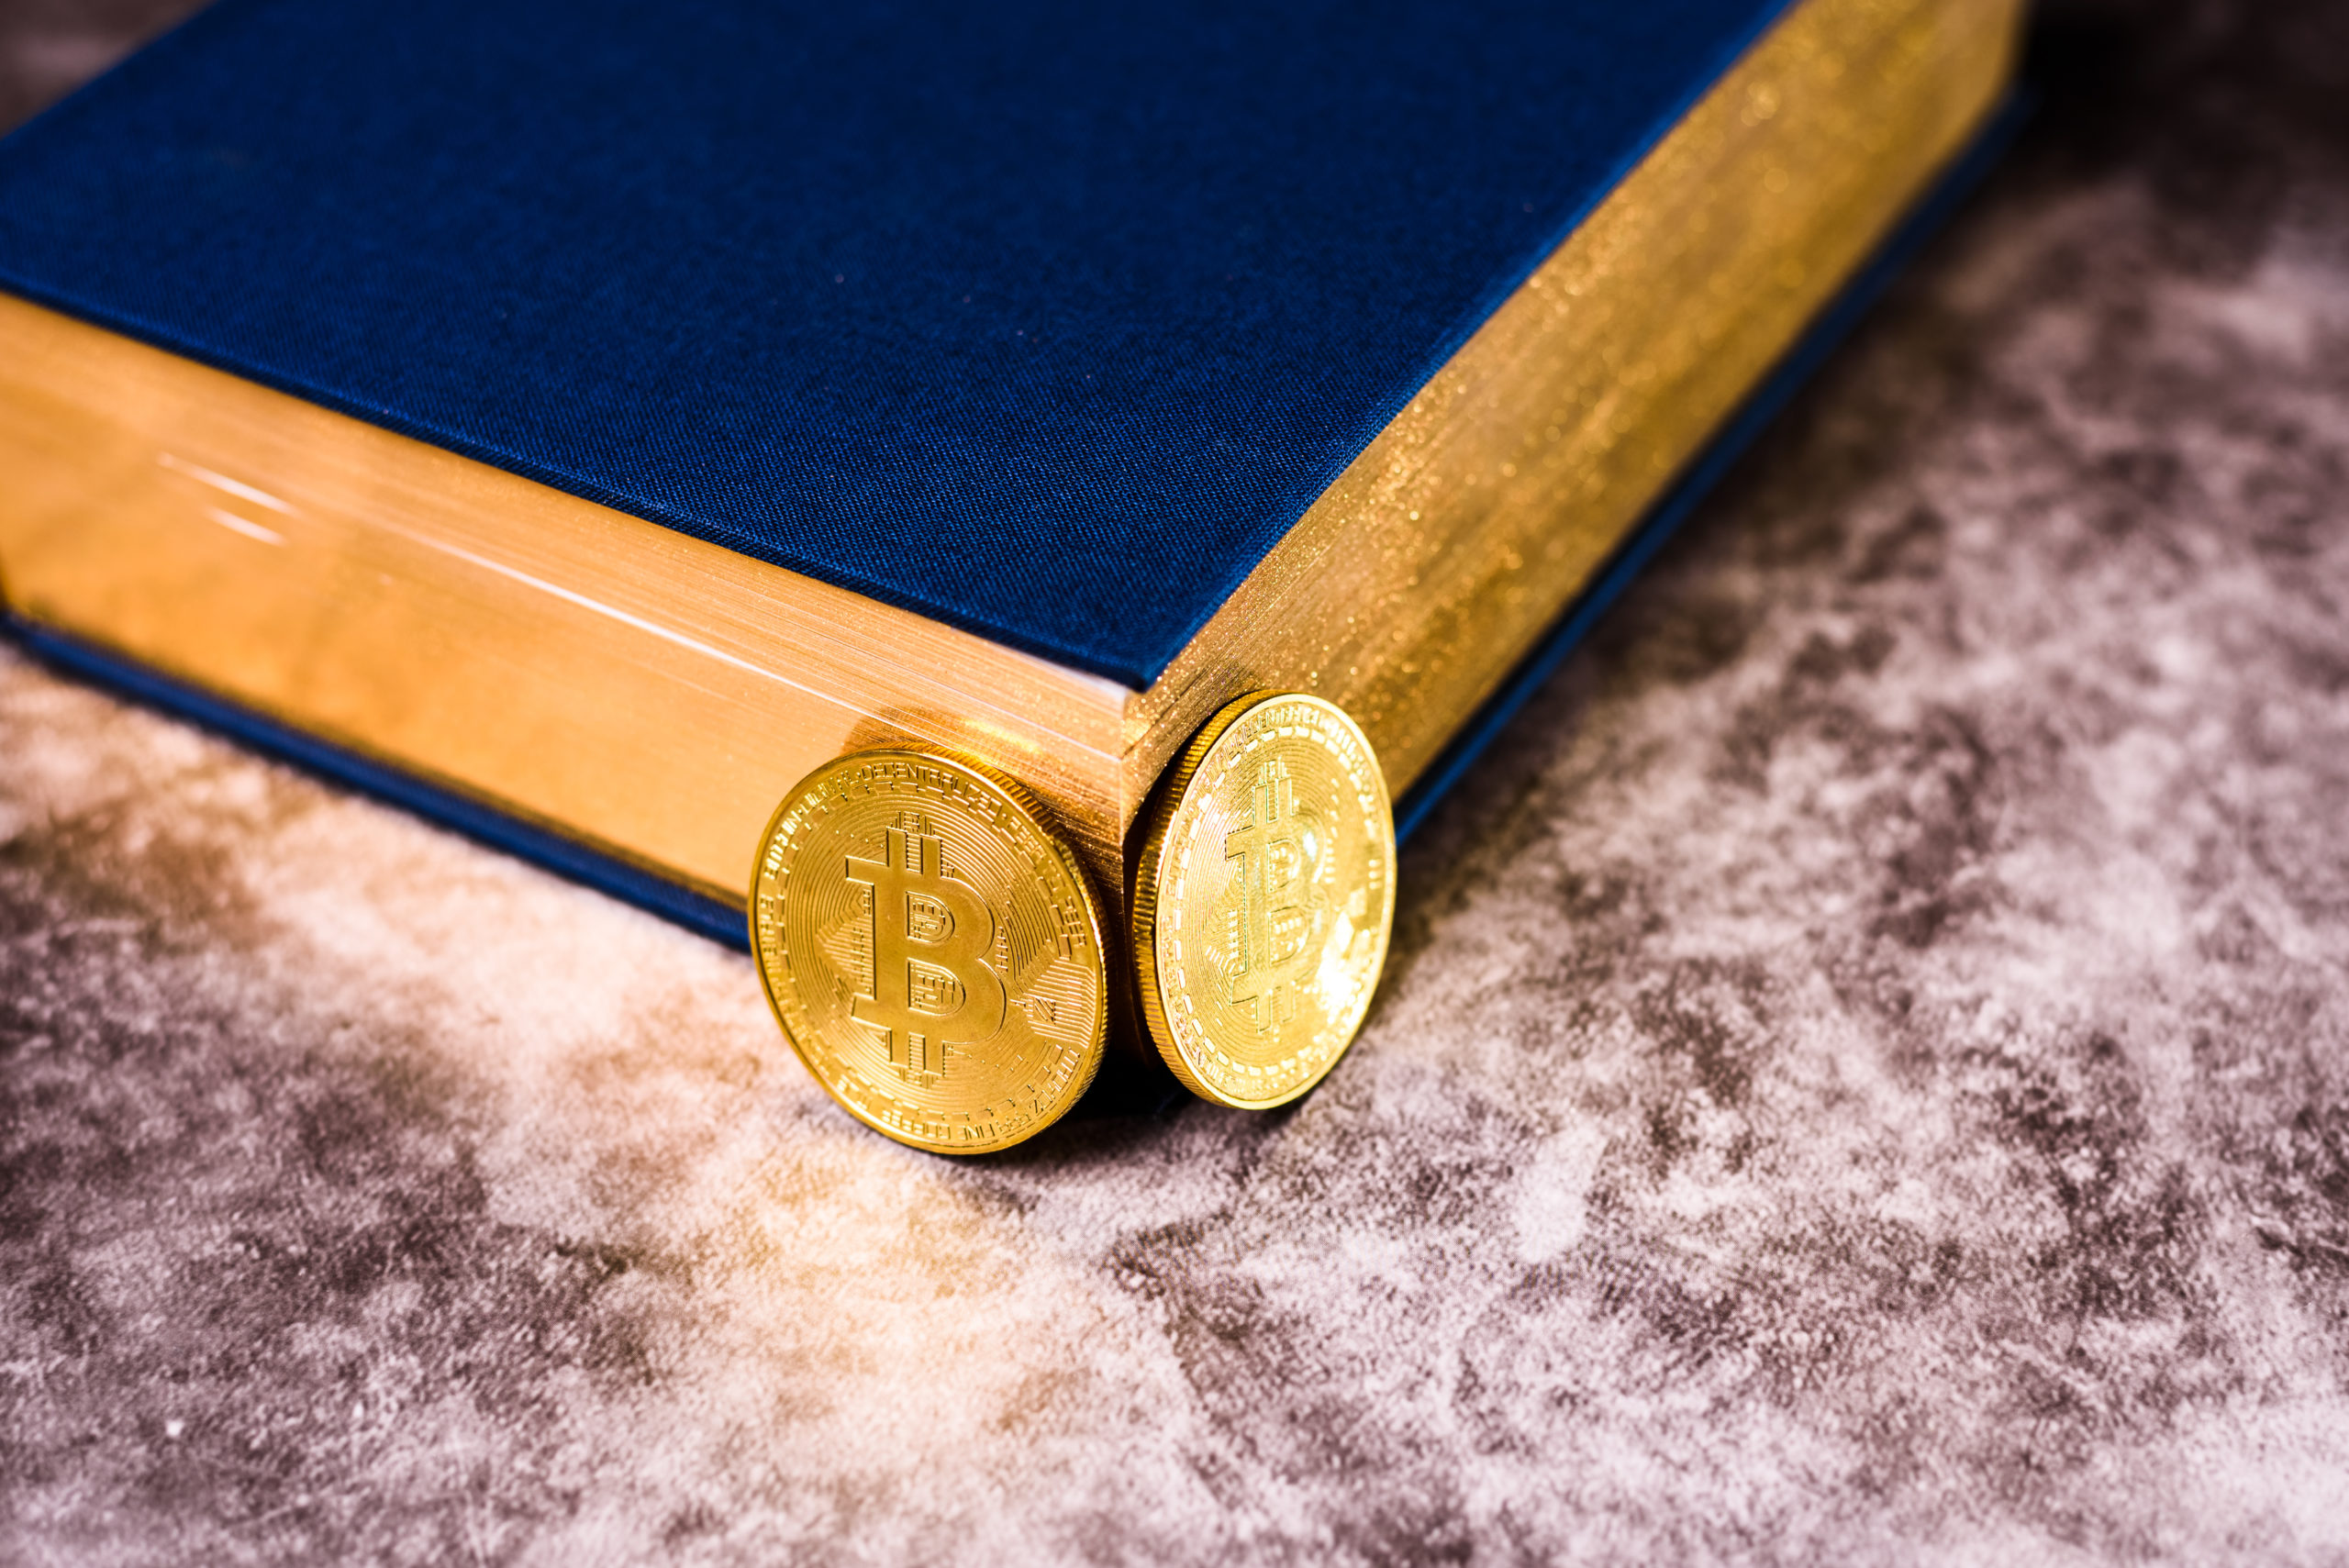 satoshi doneminden kalma bitcoin btc cuzdani harekete gecti